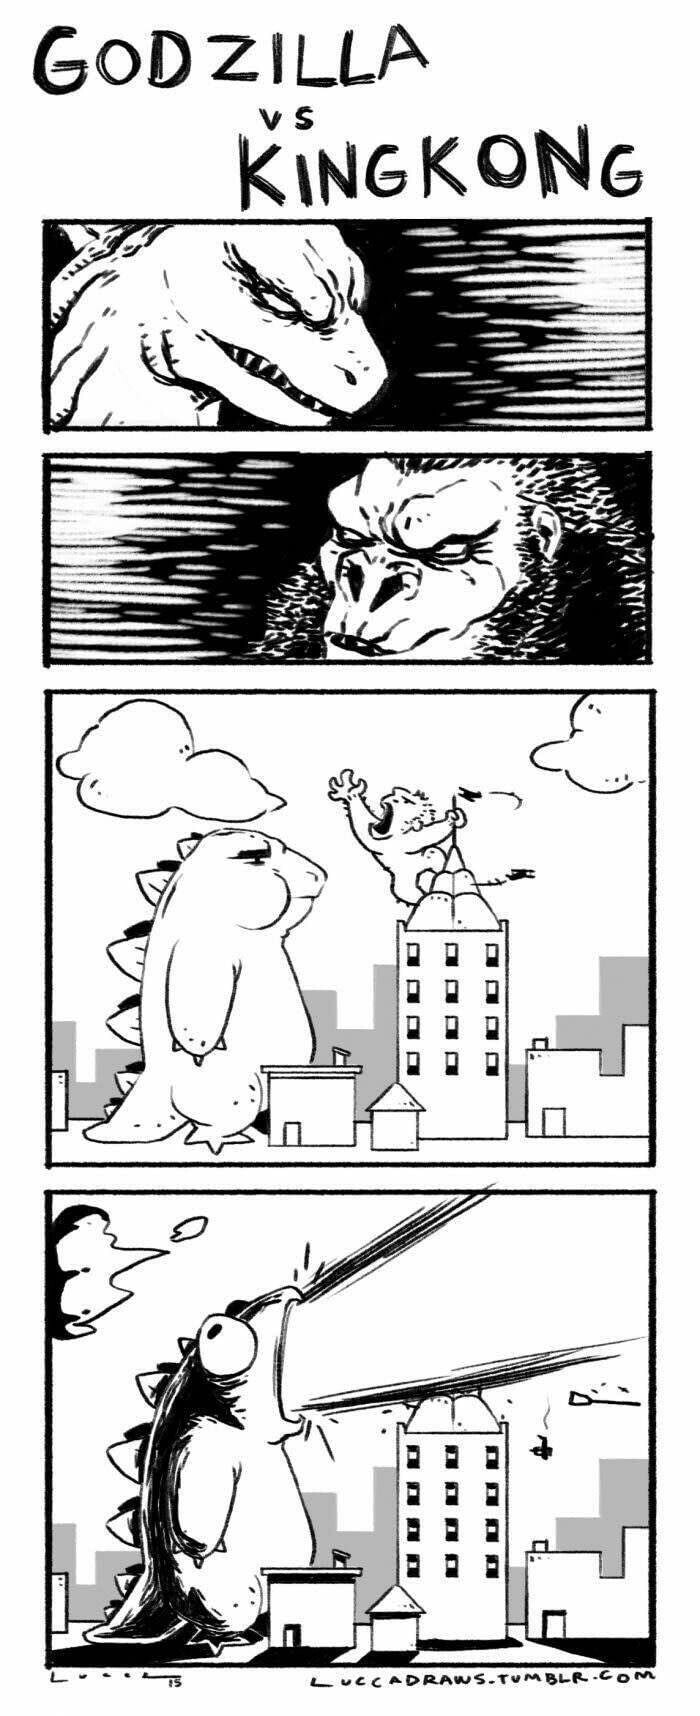 Godzilla vs king Kong - meme